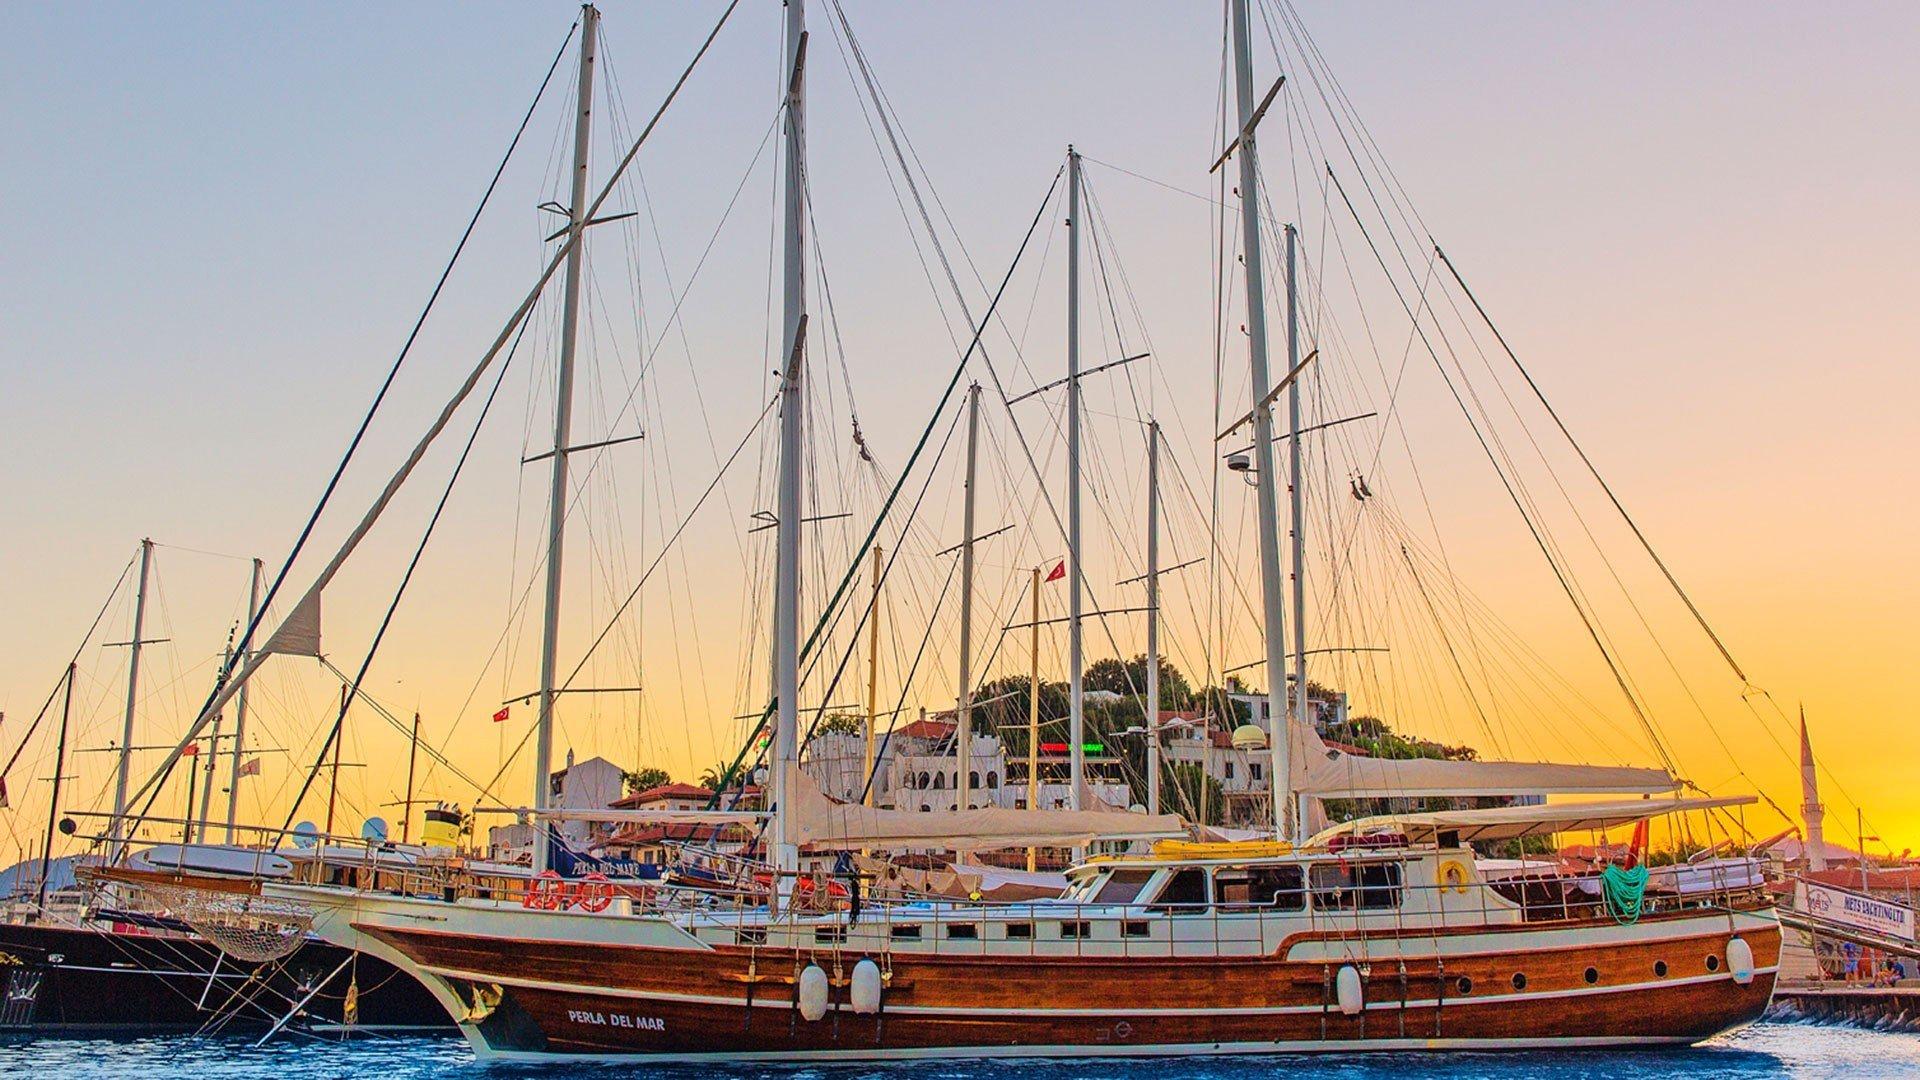 Gulet Perla Del Mar